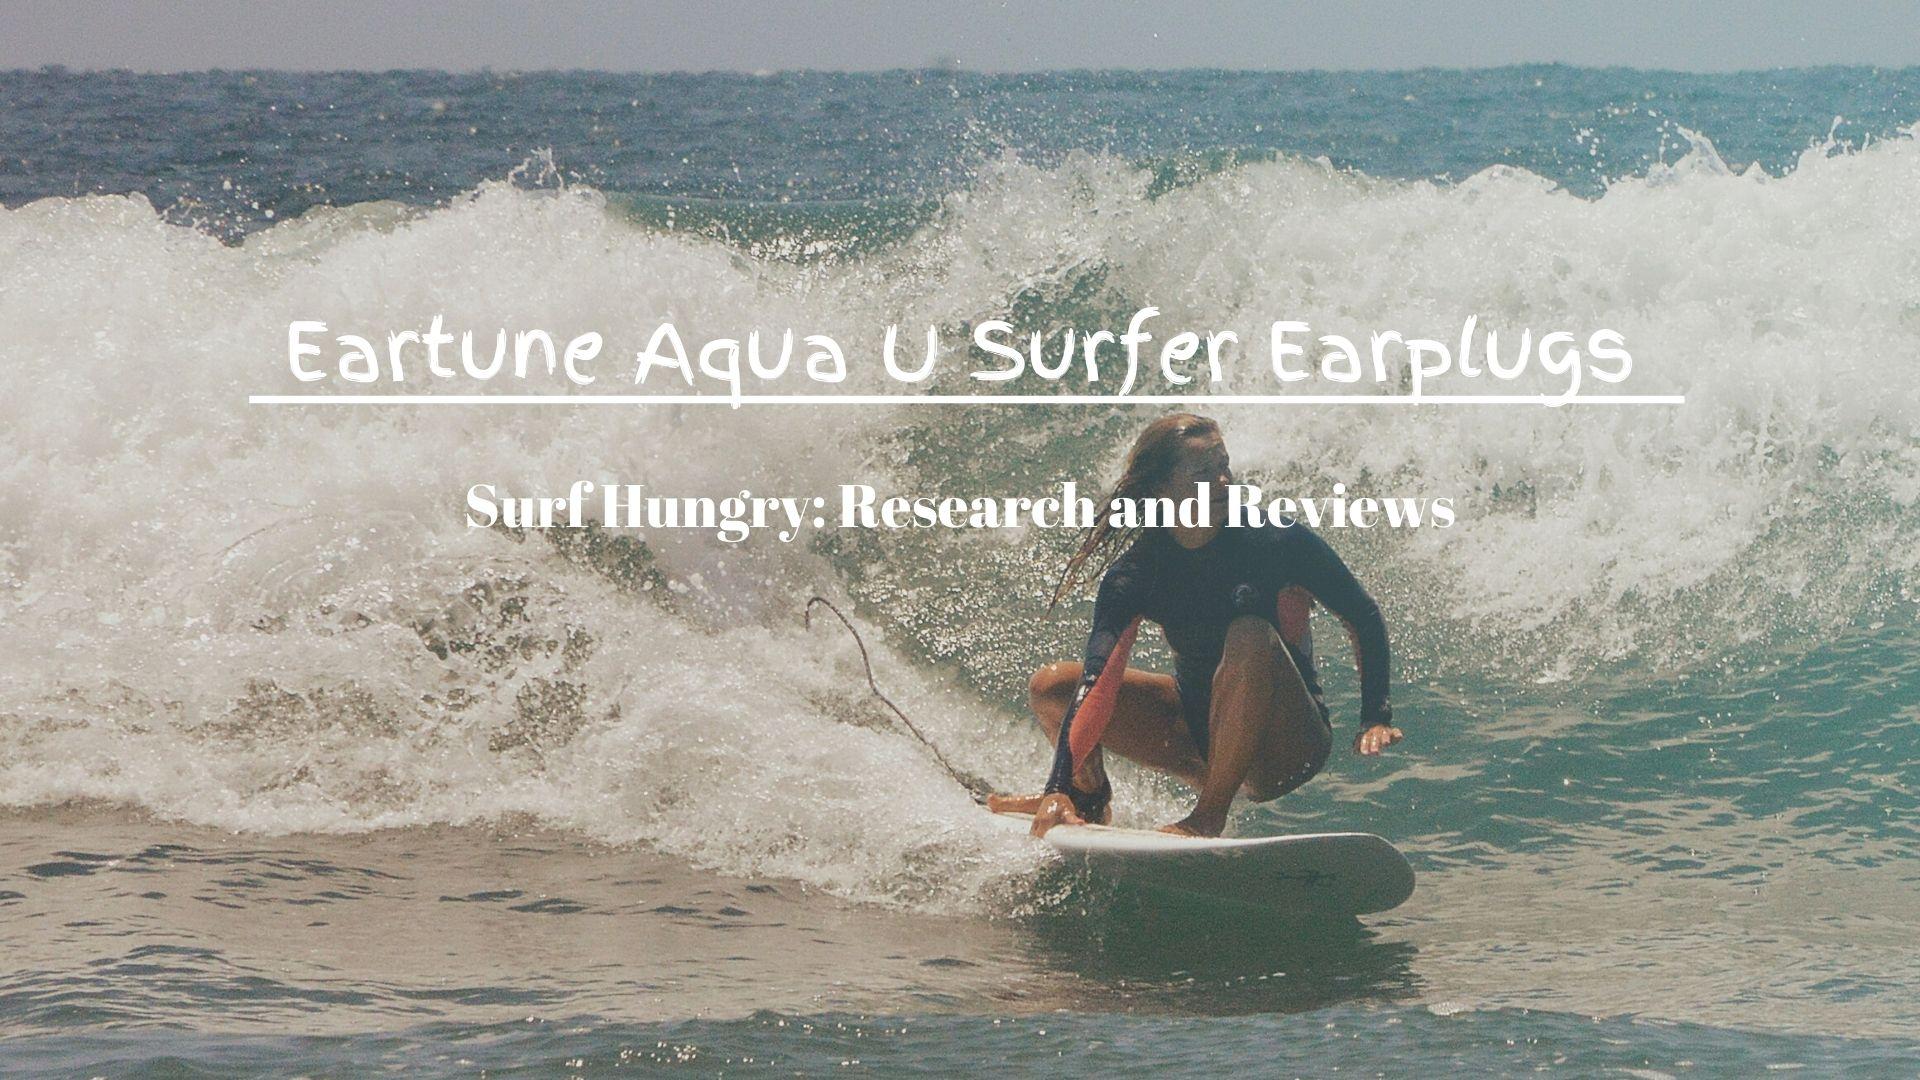 eartune aqua u surfer earplugs